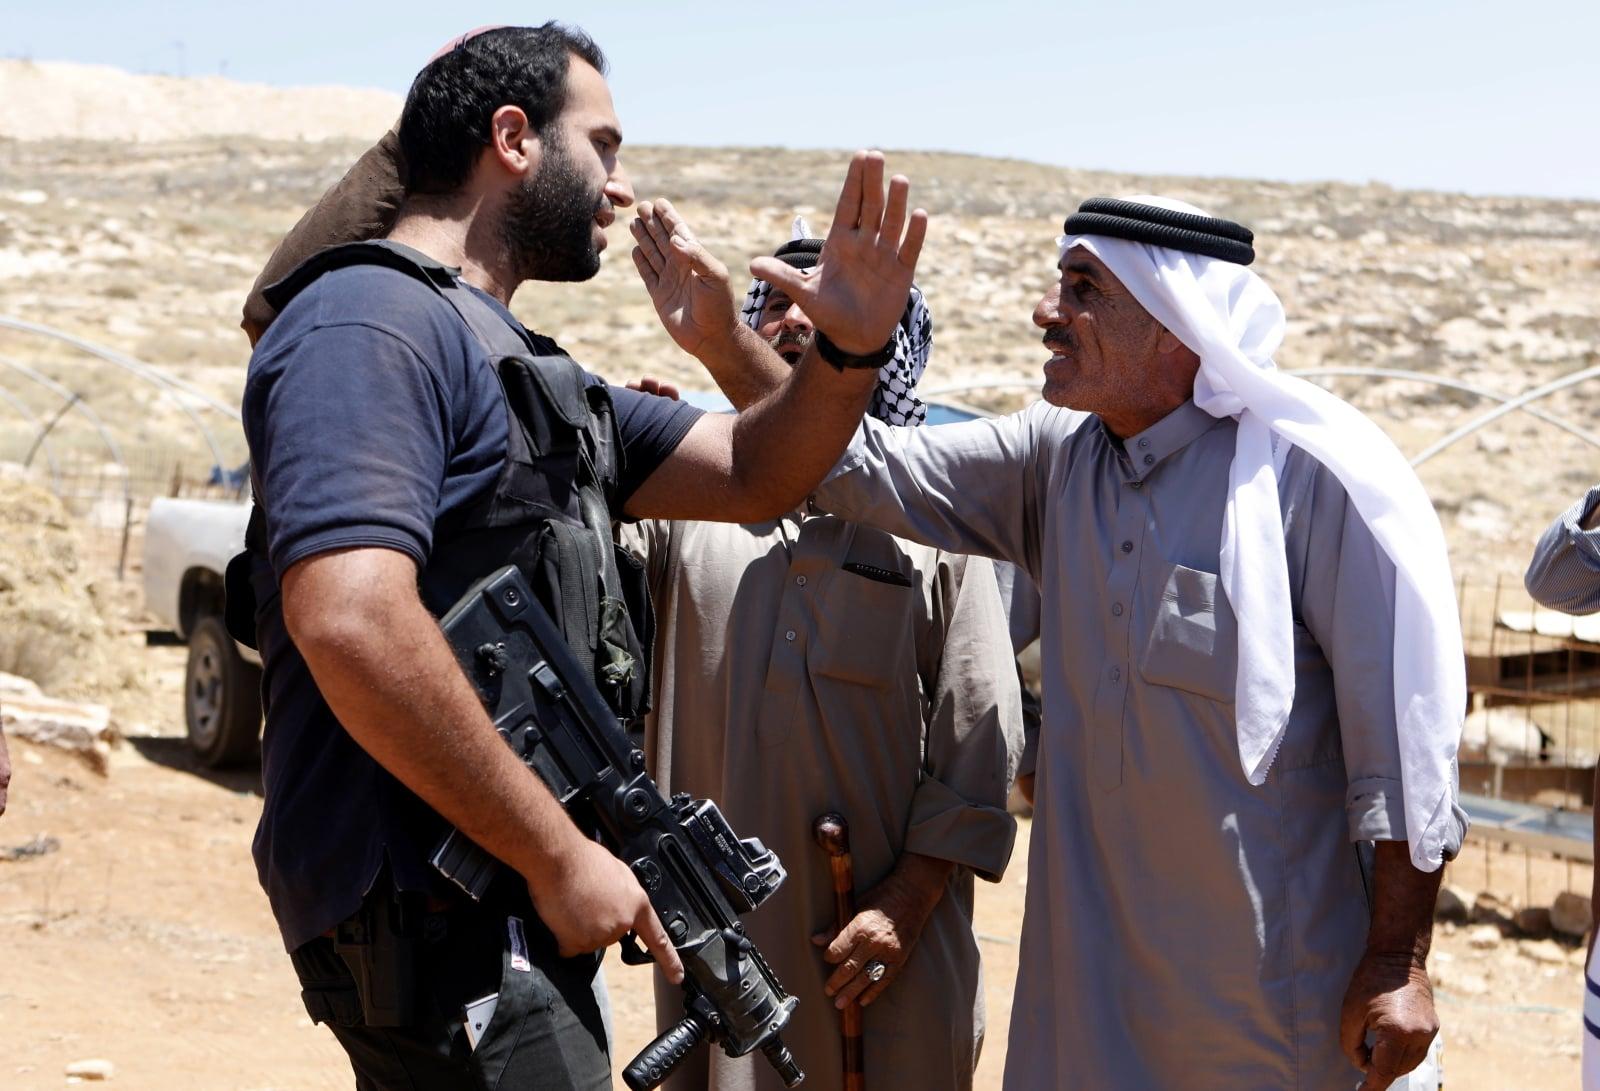 Konflit Izraelsko - Palestyński fot. EPA/ABED AL HASHLAMOUN